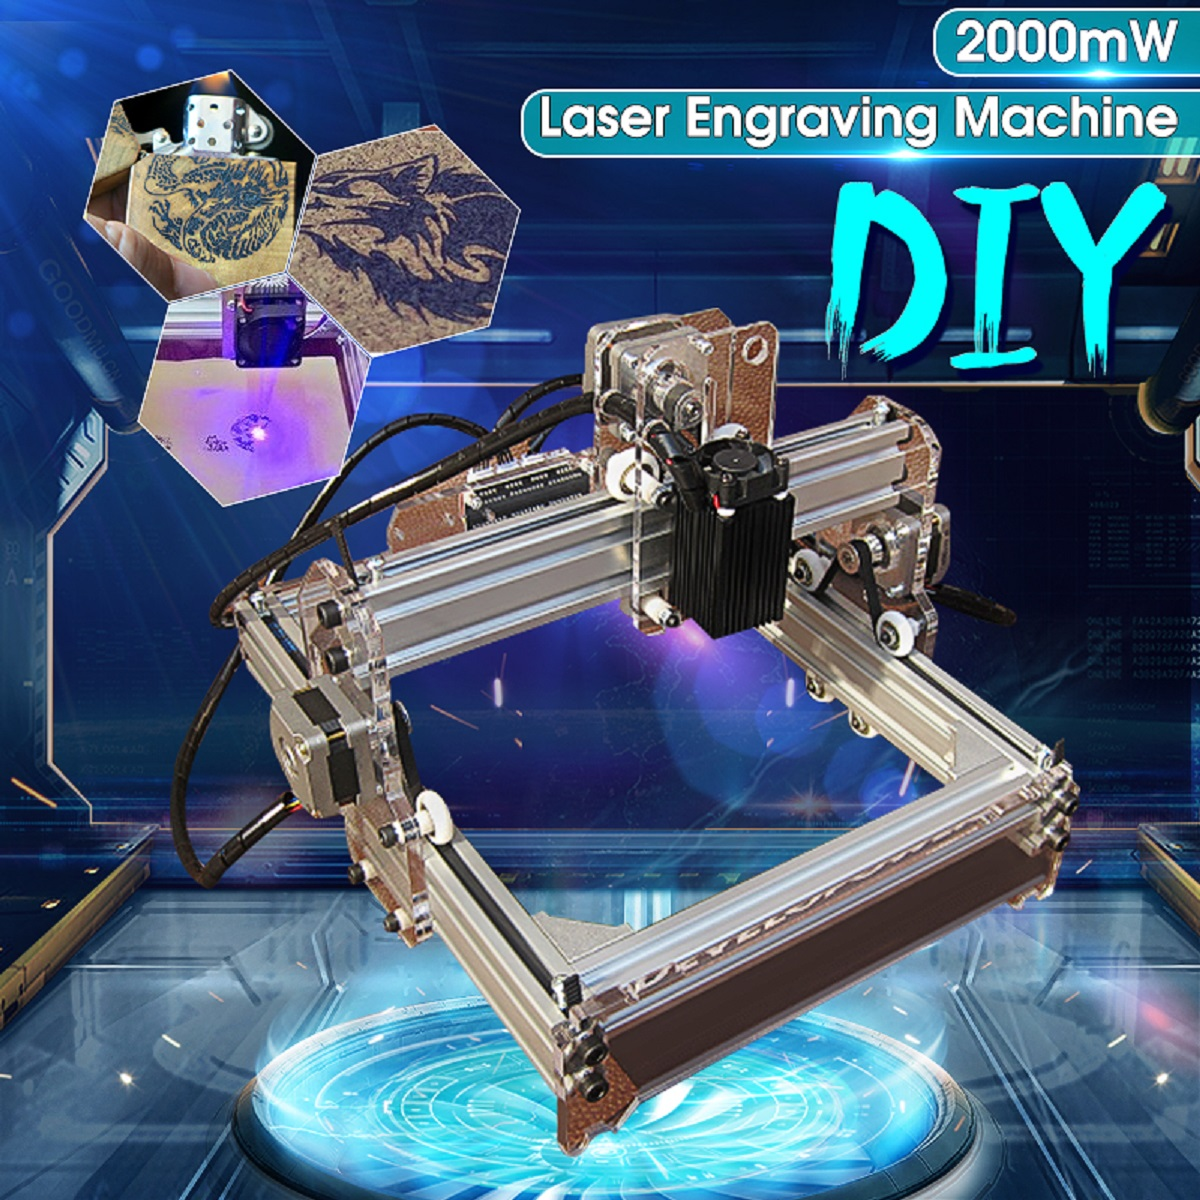 2000MW A5 17x20cm Laser Engraver Cutting Machine Desktop Engraving CNC Printer DIY Desktop Wood Cutter